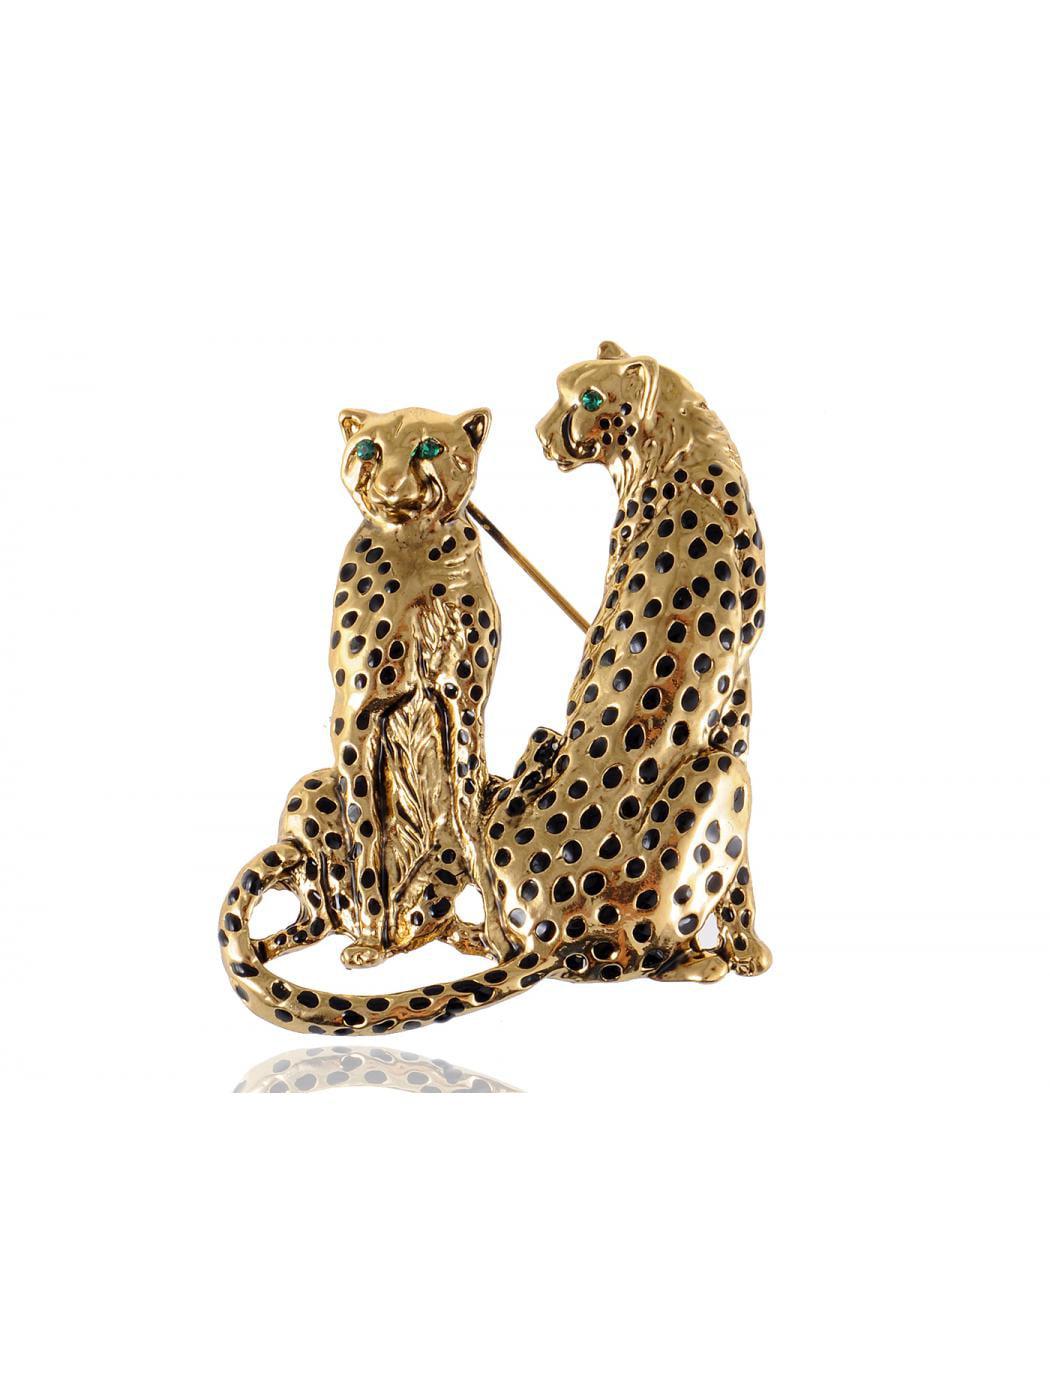 Green Eyed Crystal Rhinestone Golden Tone Twin Family Leopard Custom Pin Brooch by